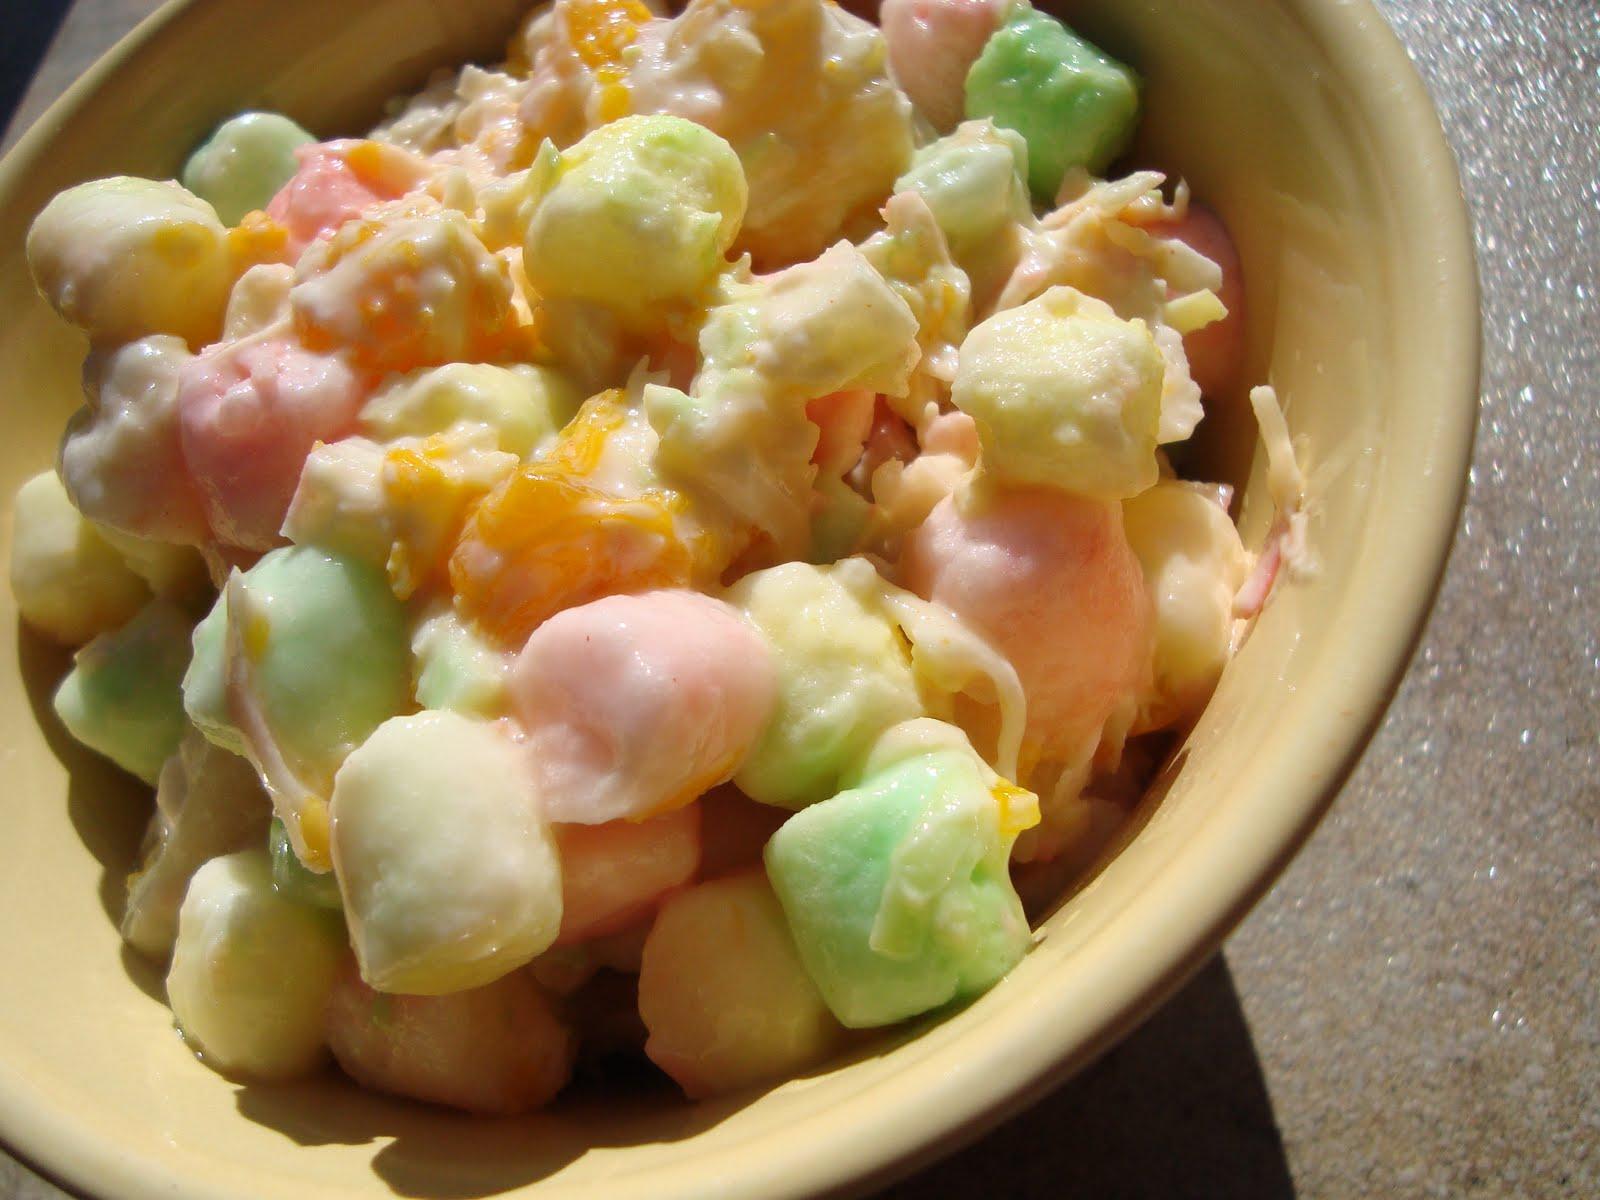 Ambrosia Salad Cool Whip Marshmallows Ambrosia Recipe Cool Whip